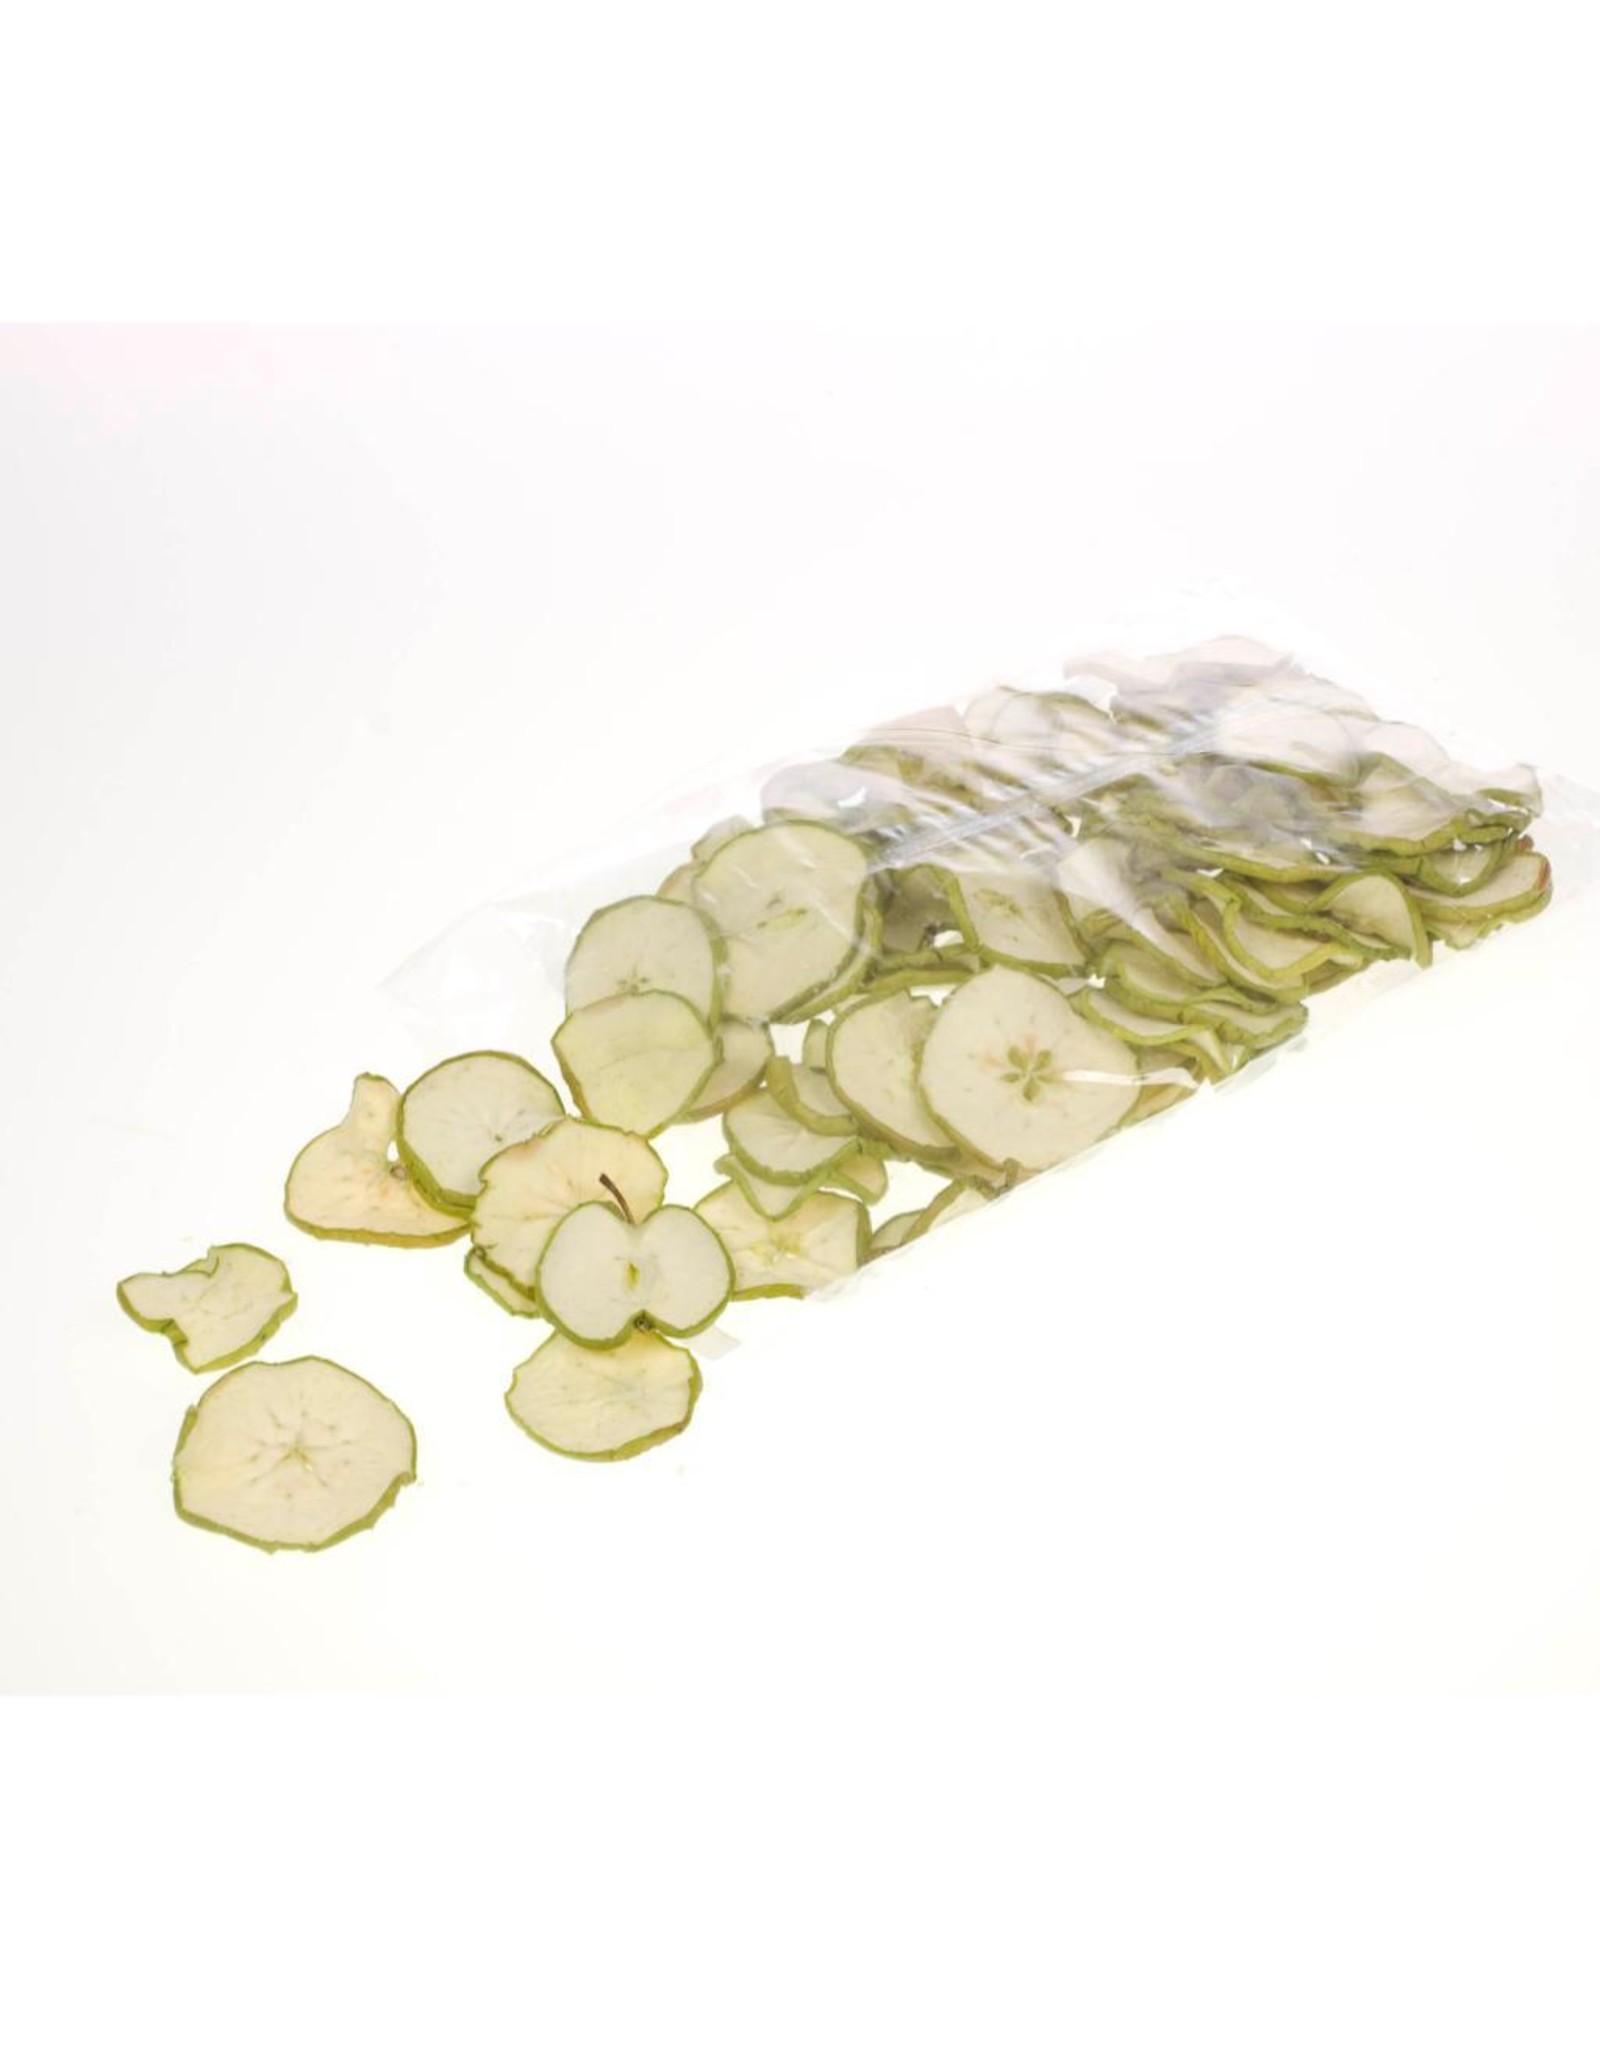 LDD Apple sliced 250gr bag SB natural green x 4